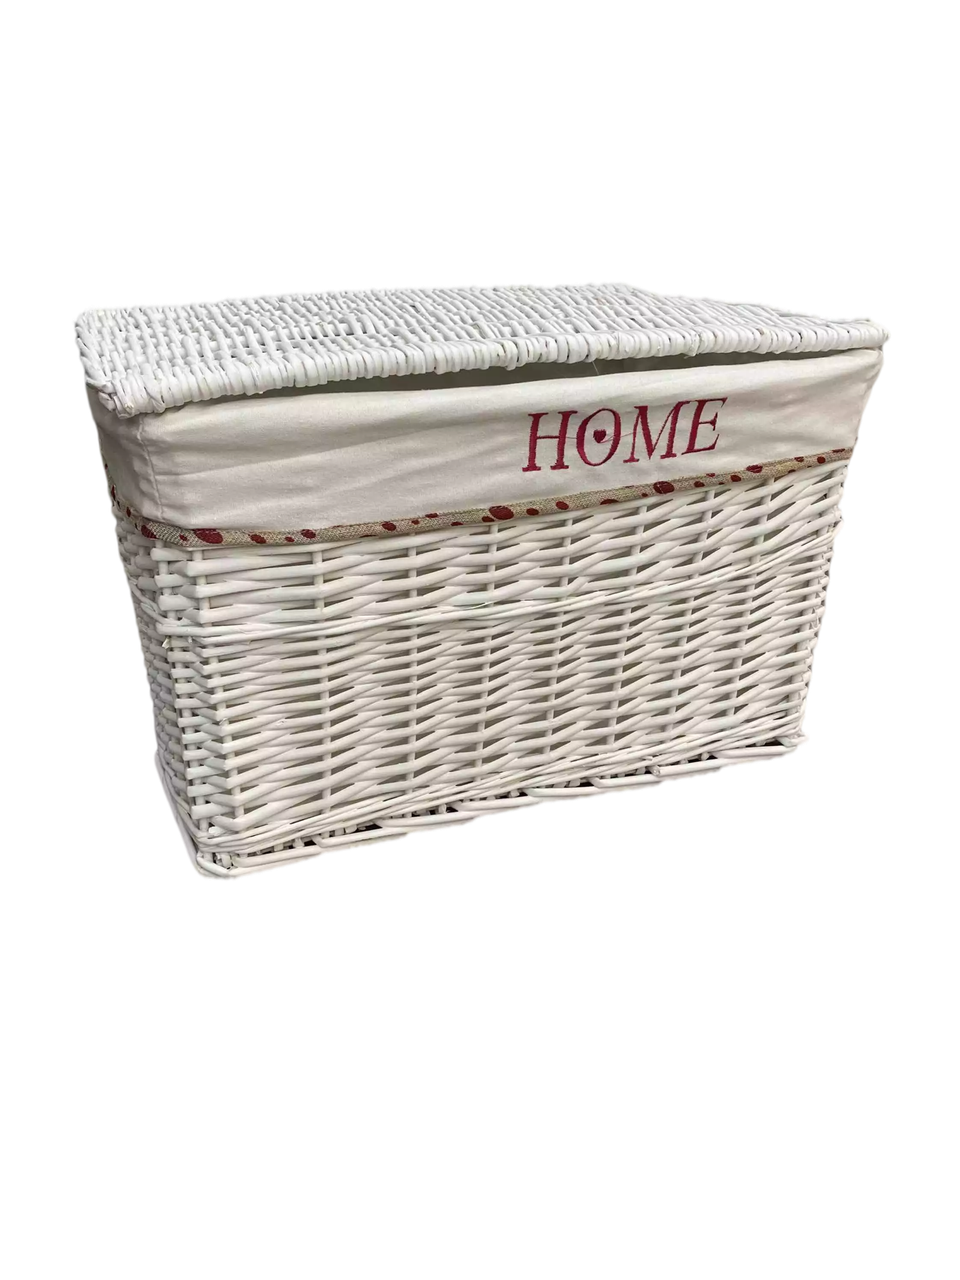 Корзина плетеная Белая прямоугольная Ива L54х38 H 35 см